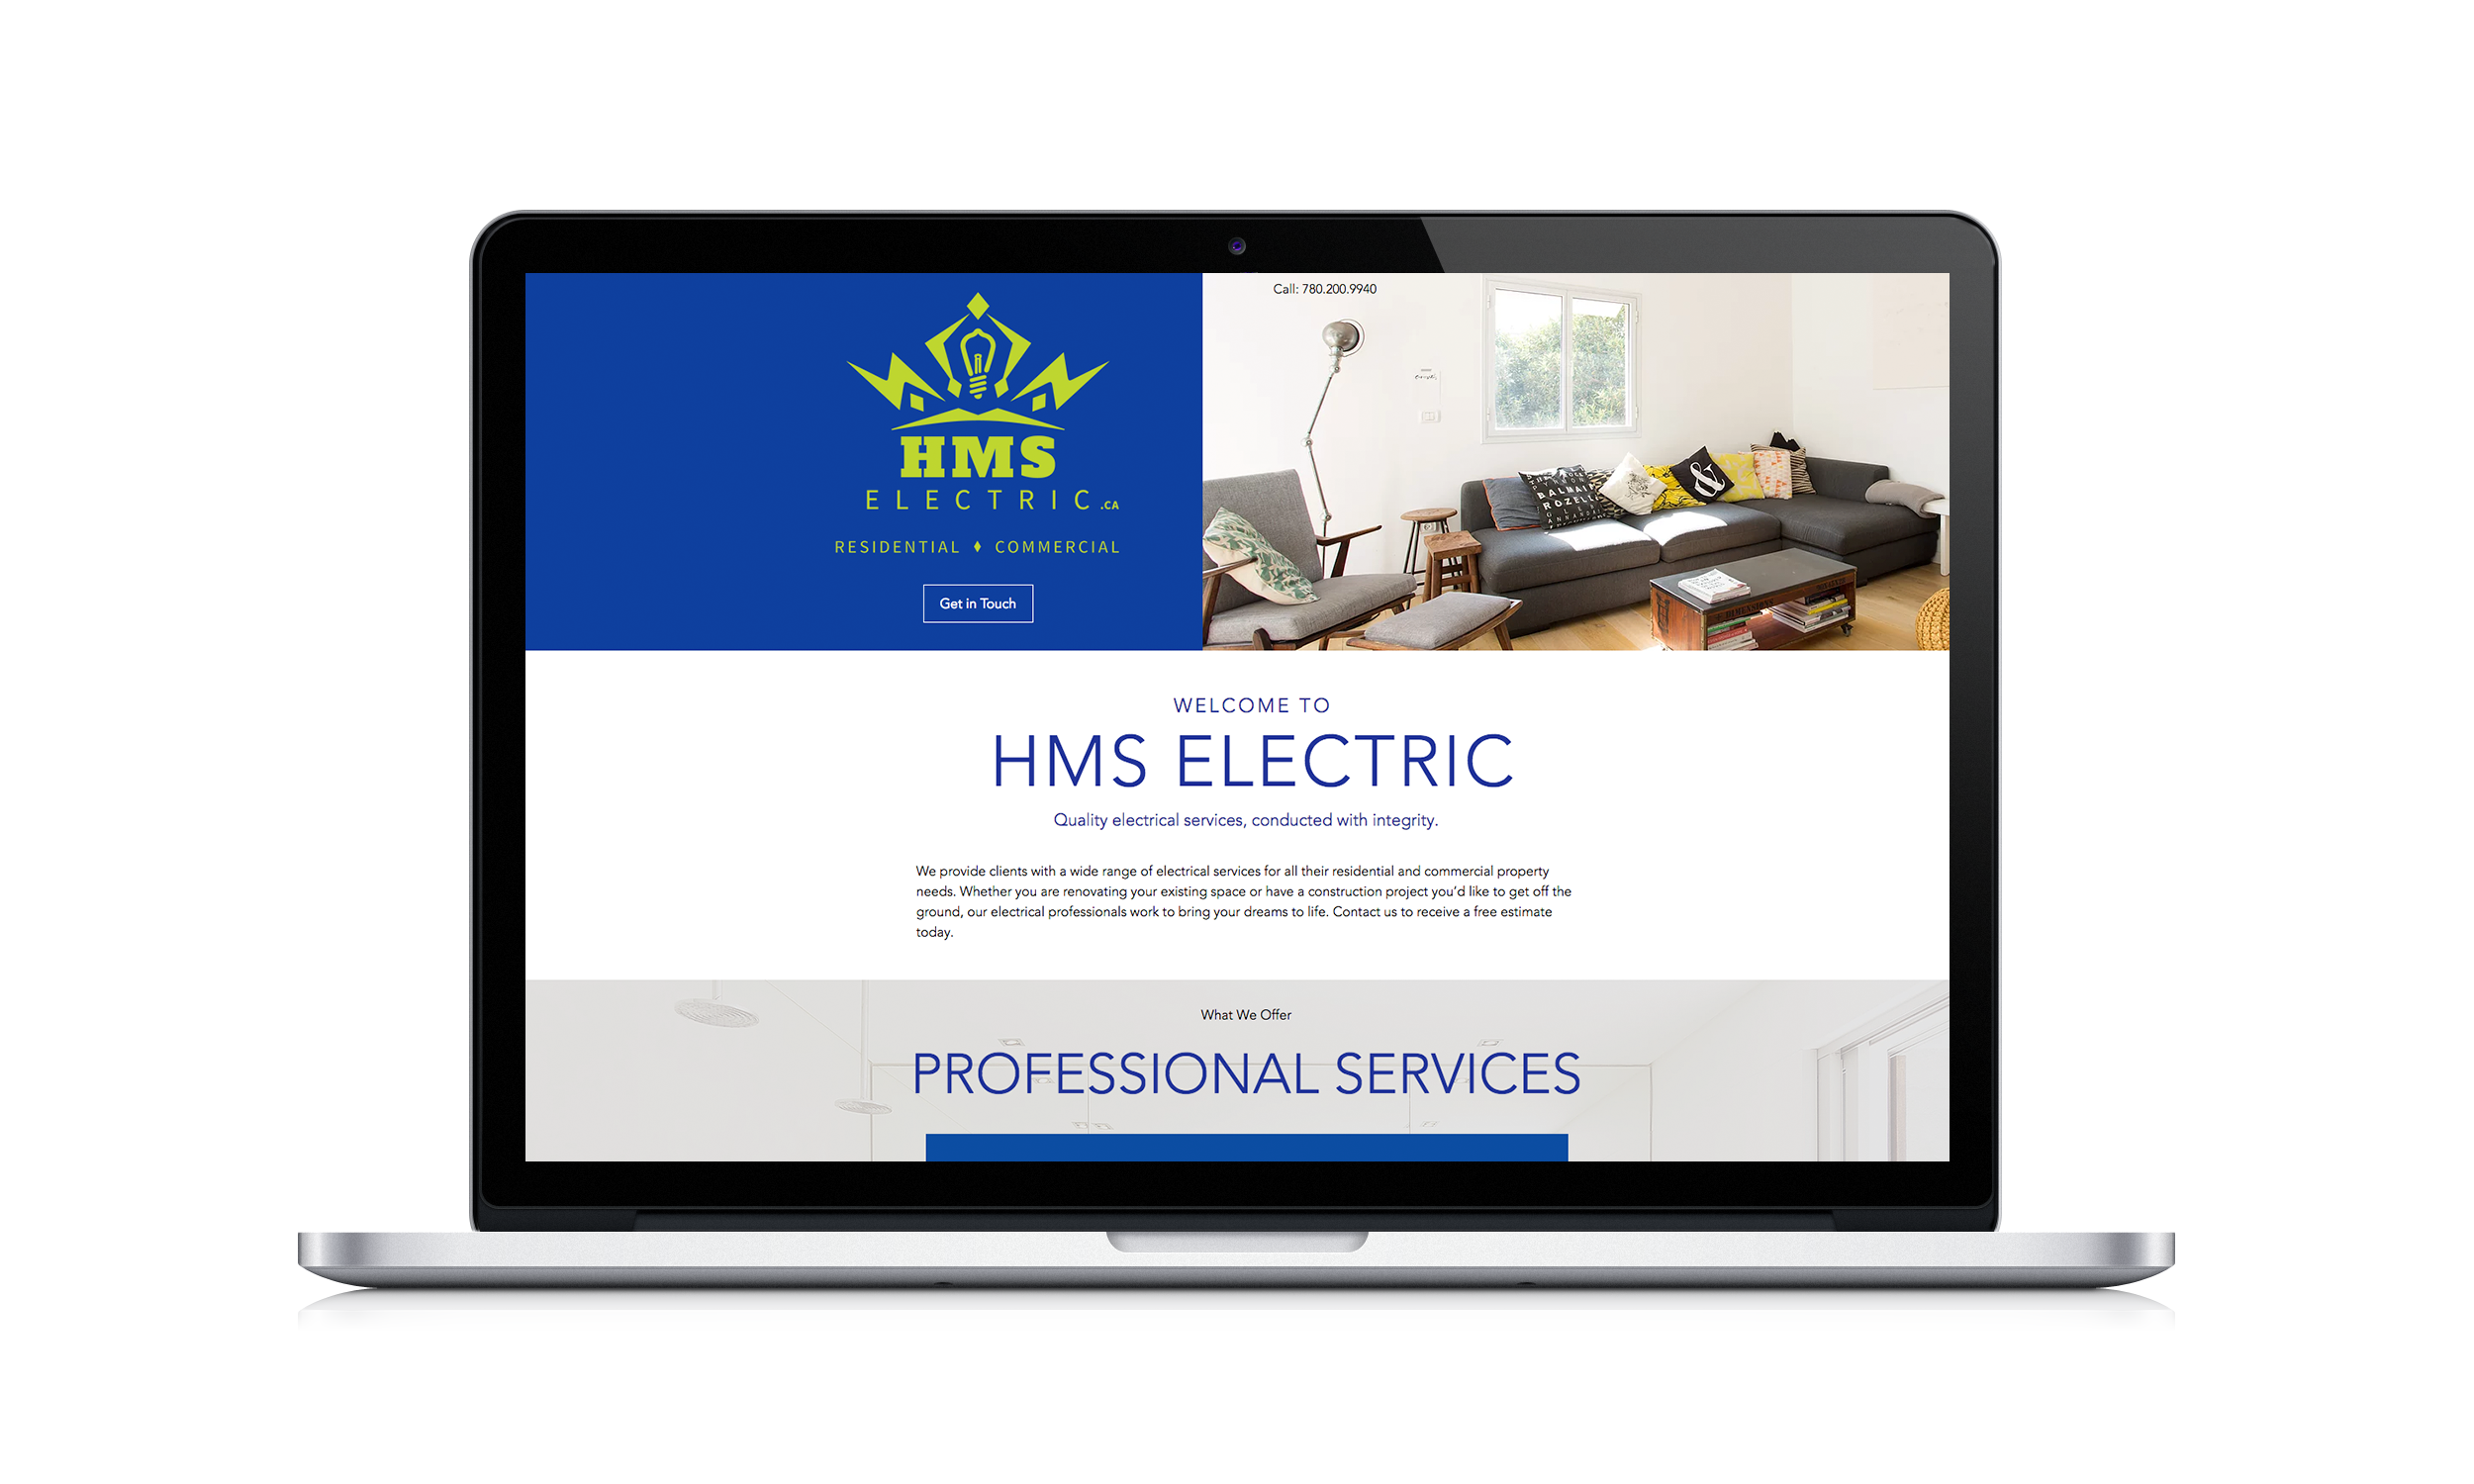 HMS Electric